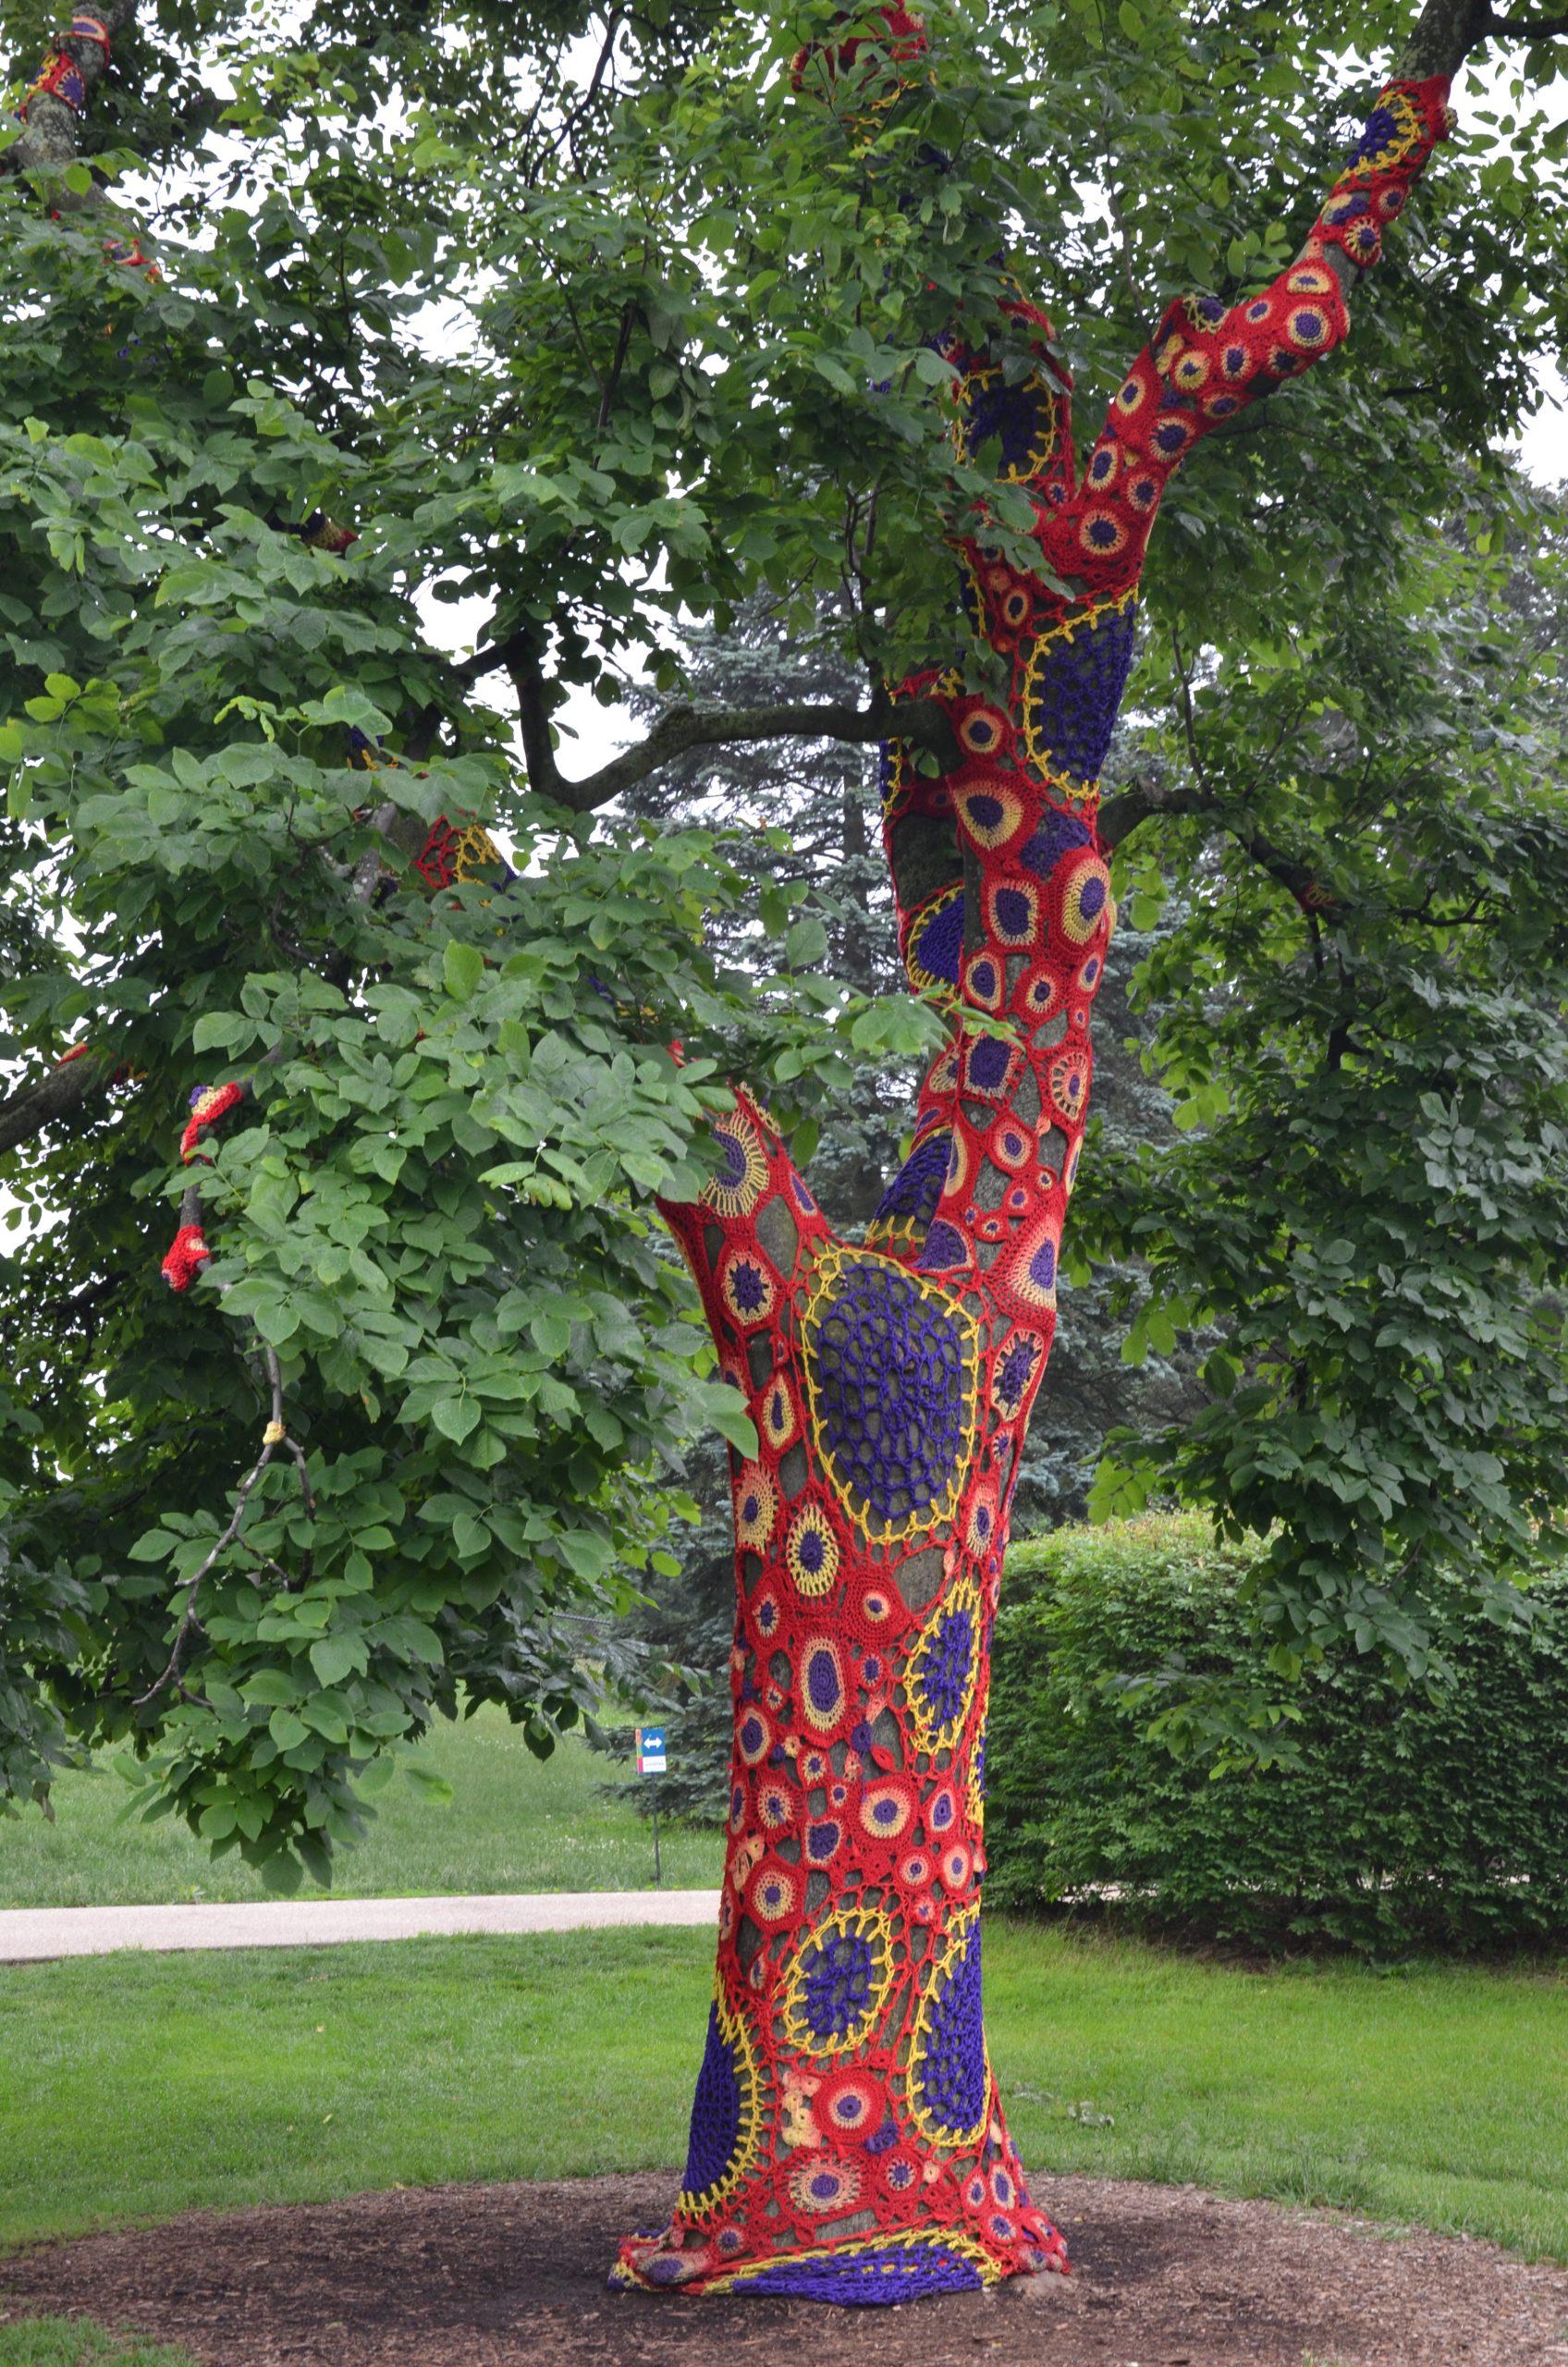 Crocheted Tree Cozy tại Arboretum